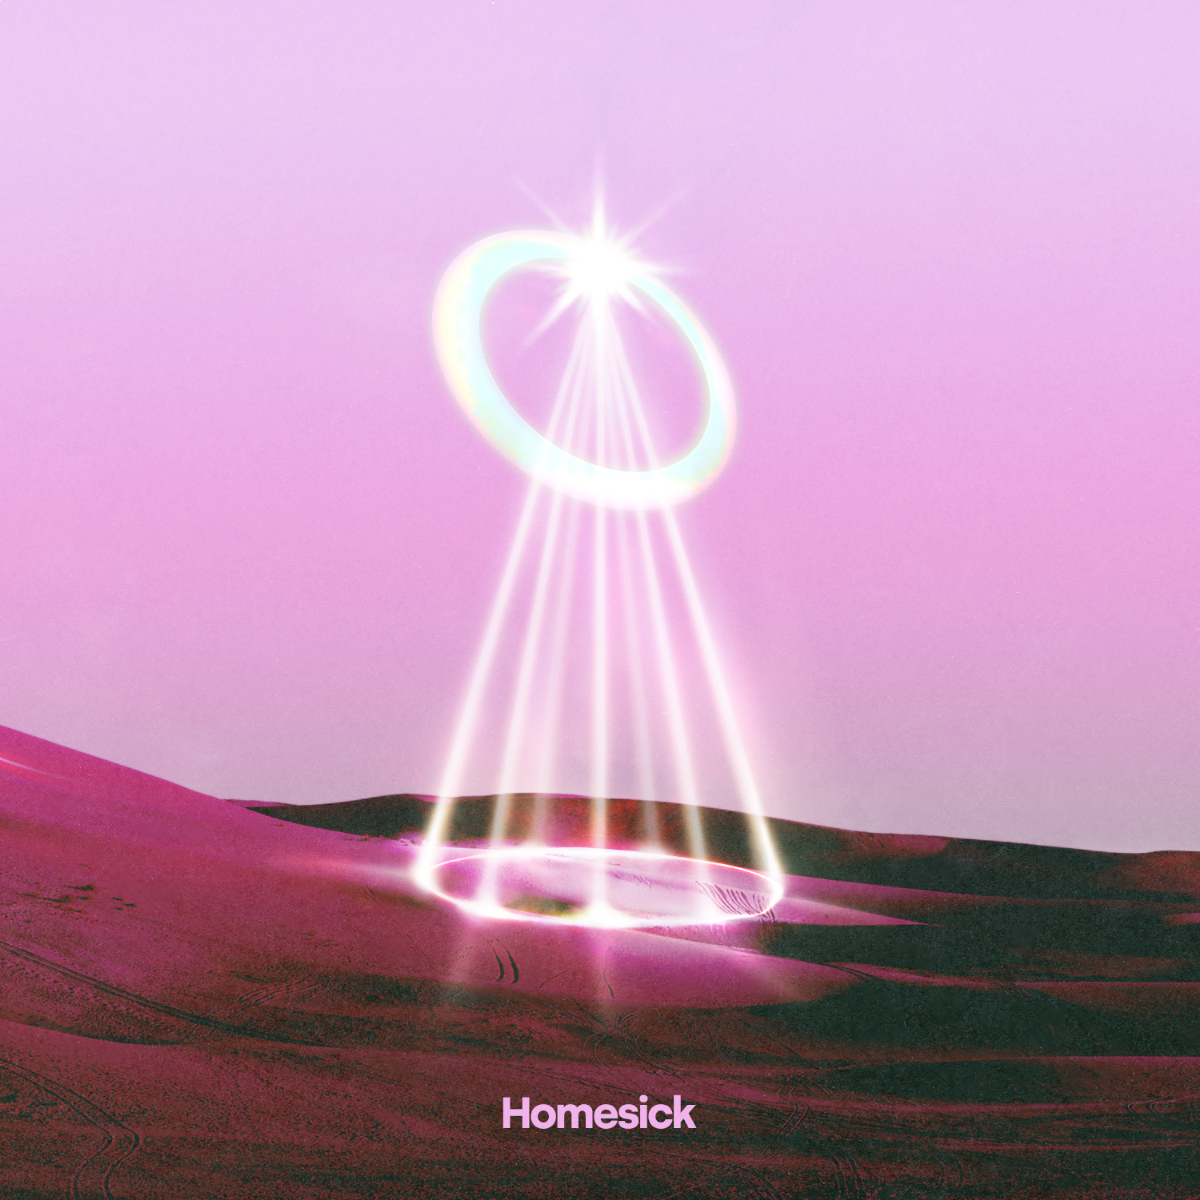 『Homesick』ジャケット